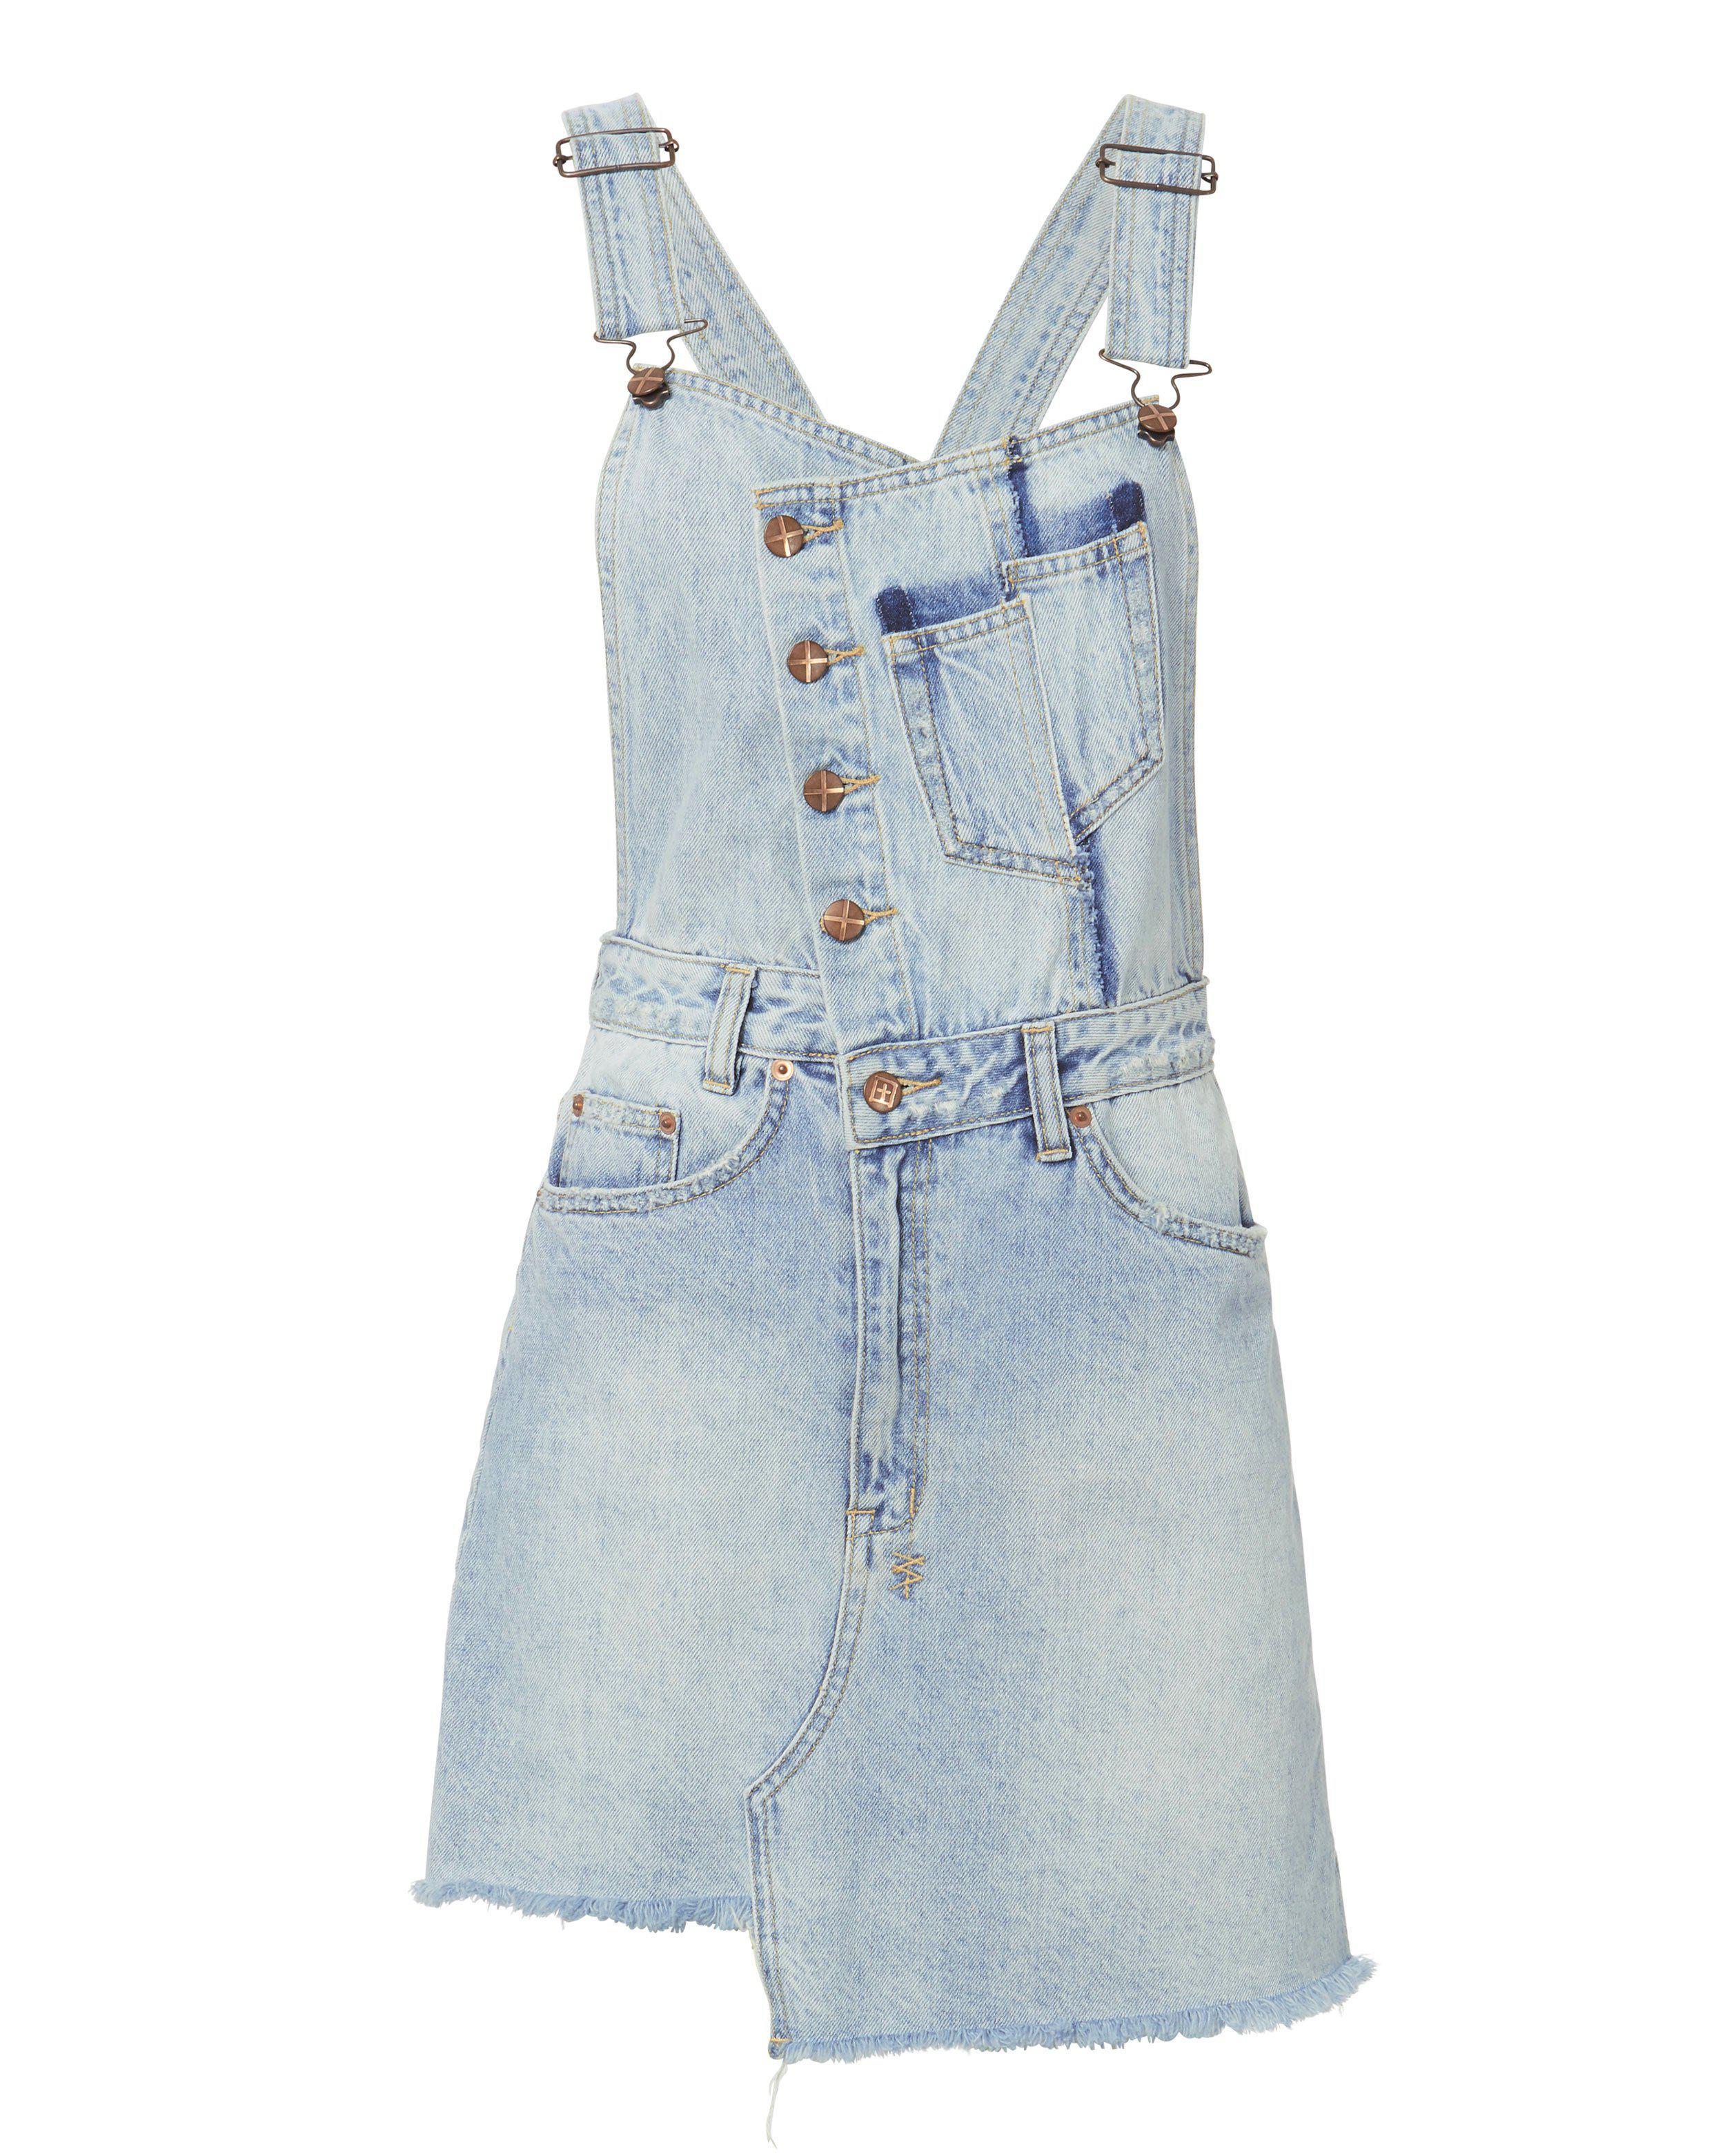 8d10d5d1975 Lyst - Ksubi Hi Pini Sliced Dress in Blue